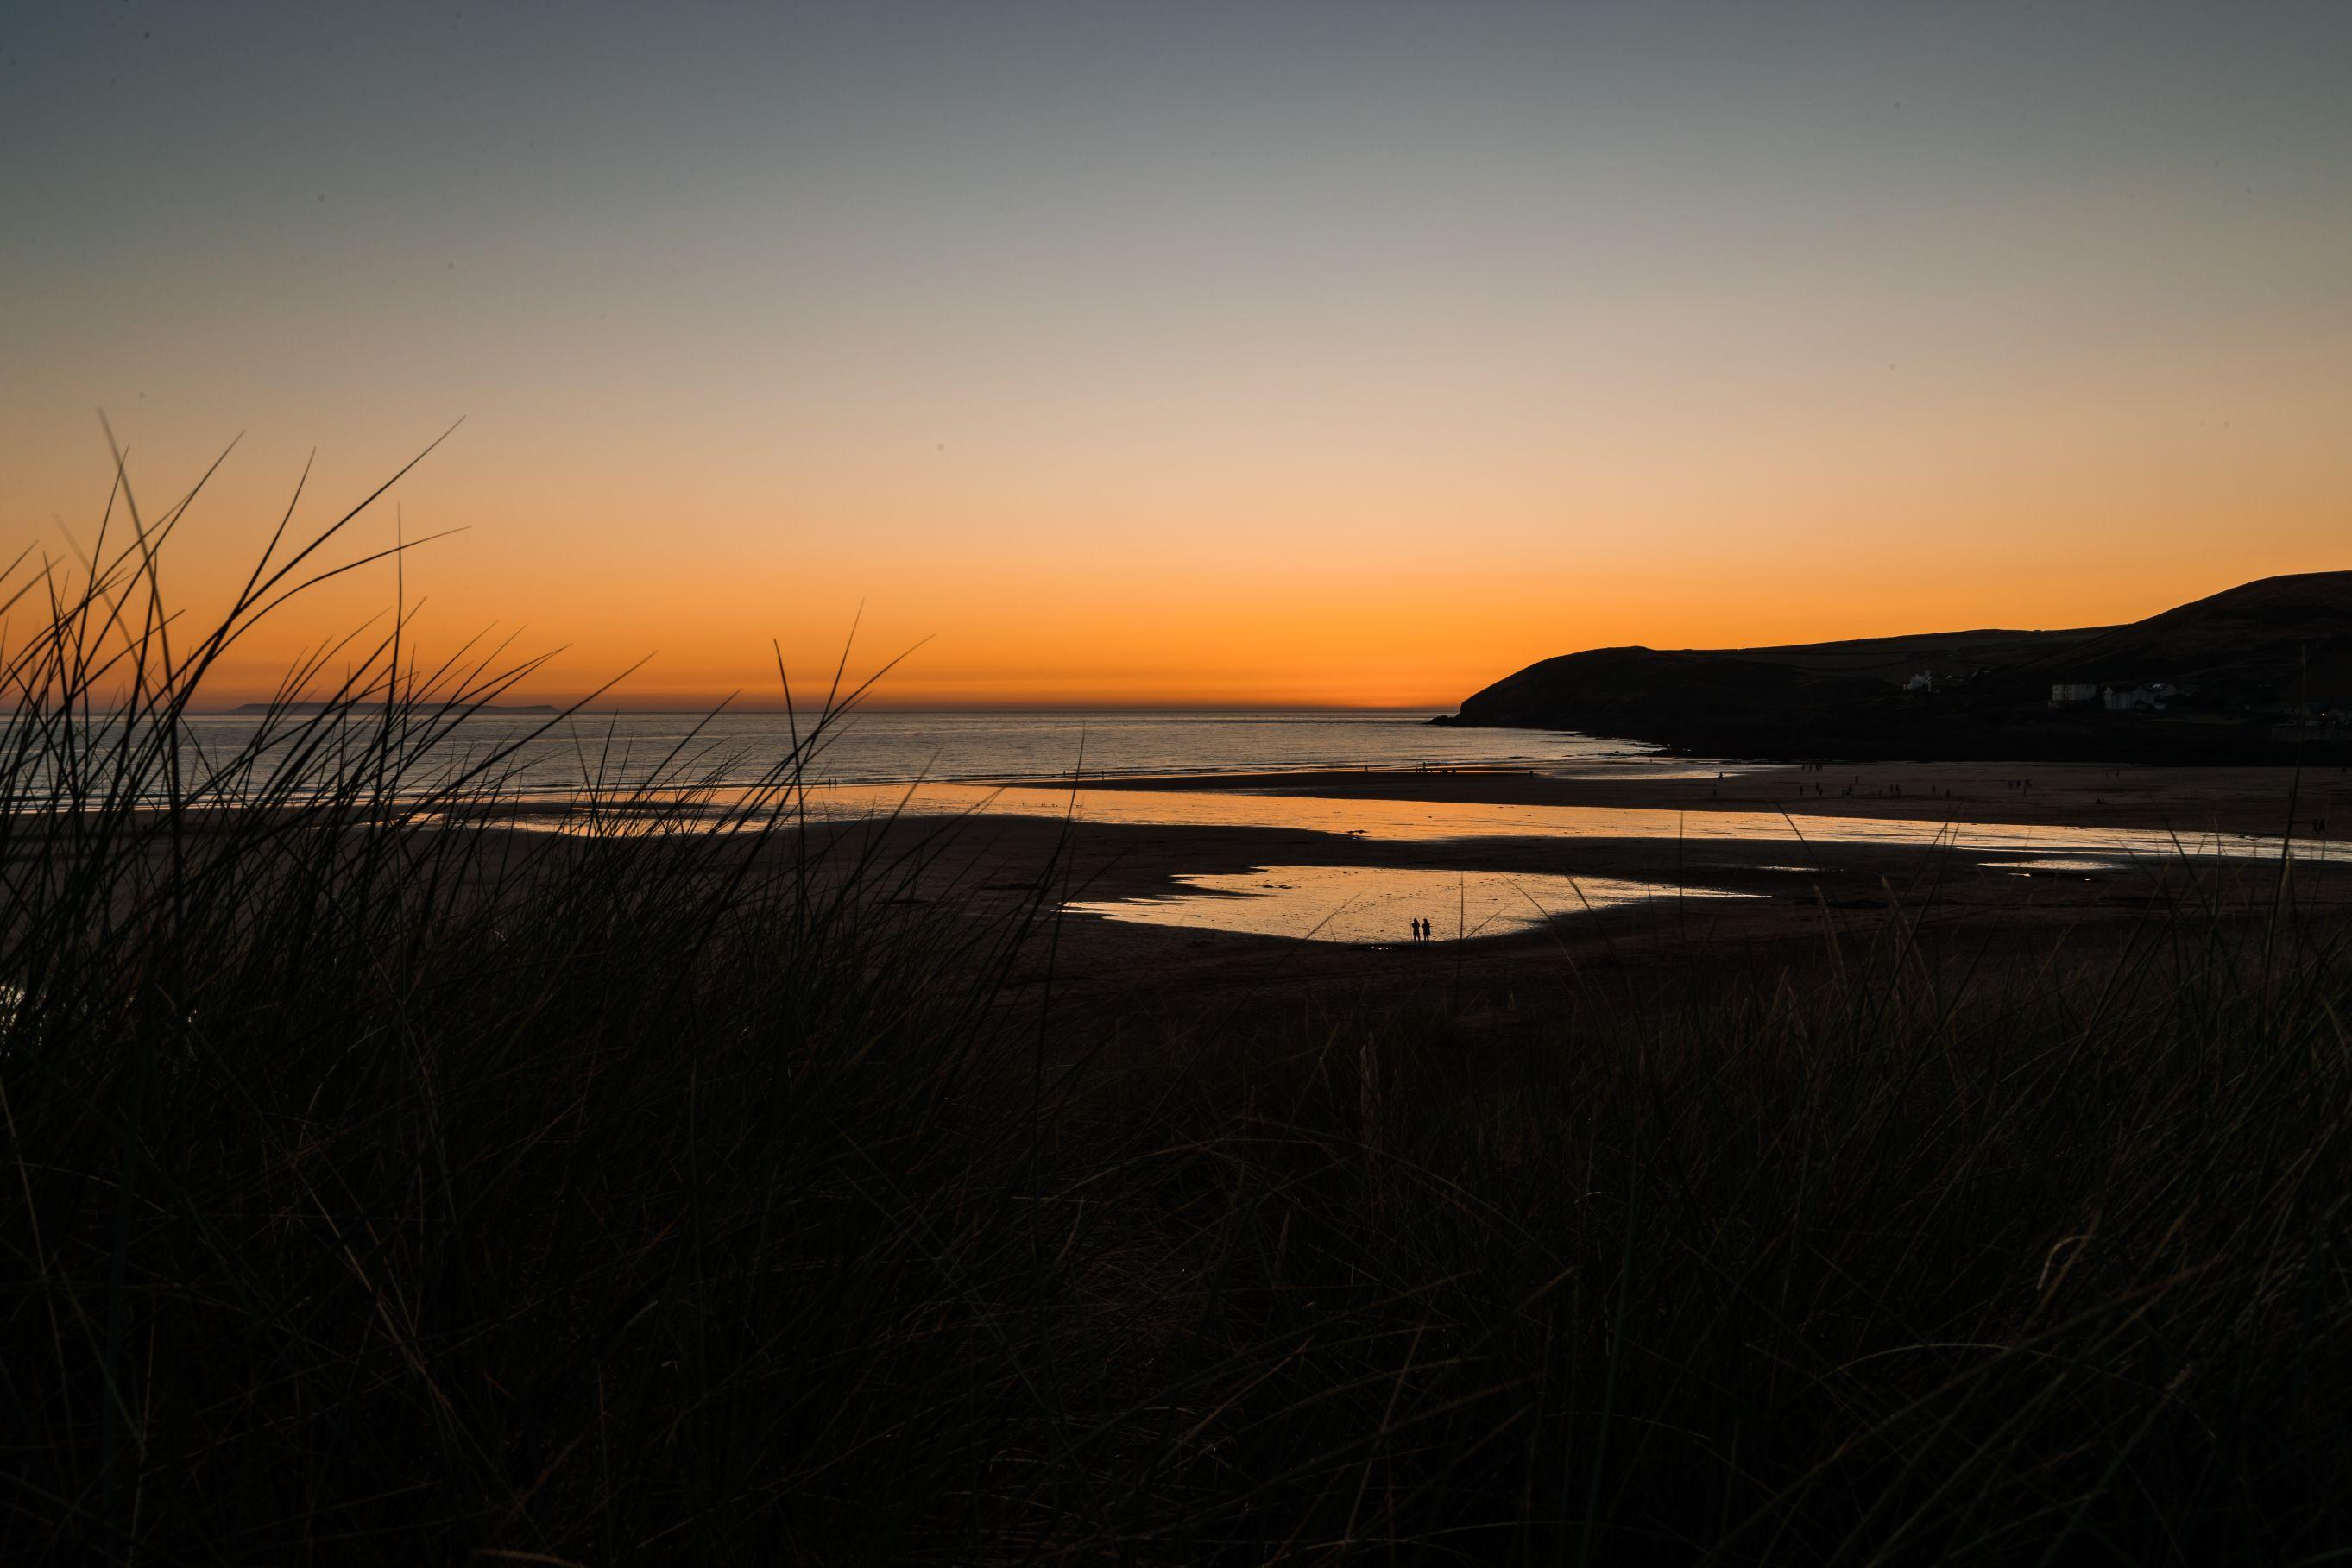 Sun setting over an english beach.